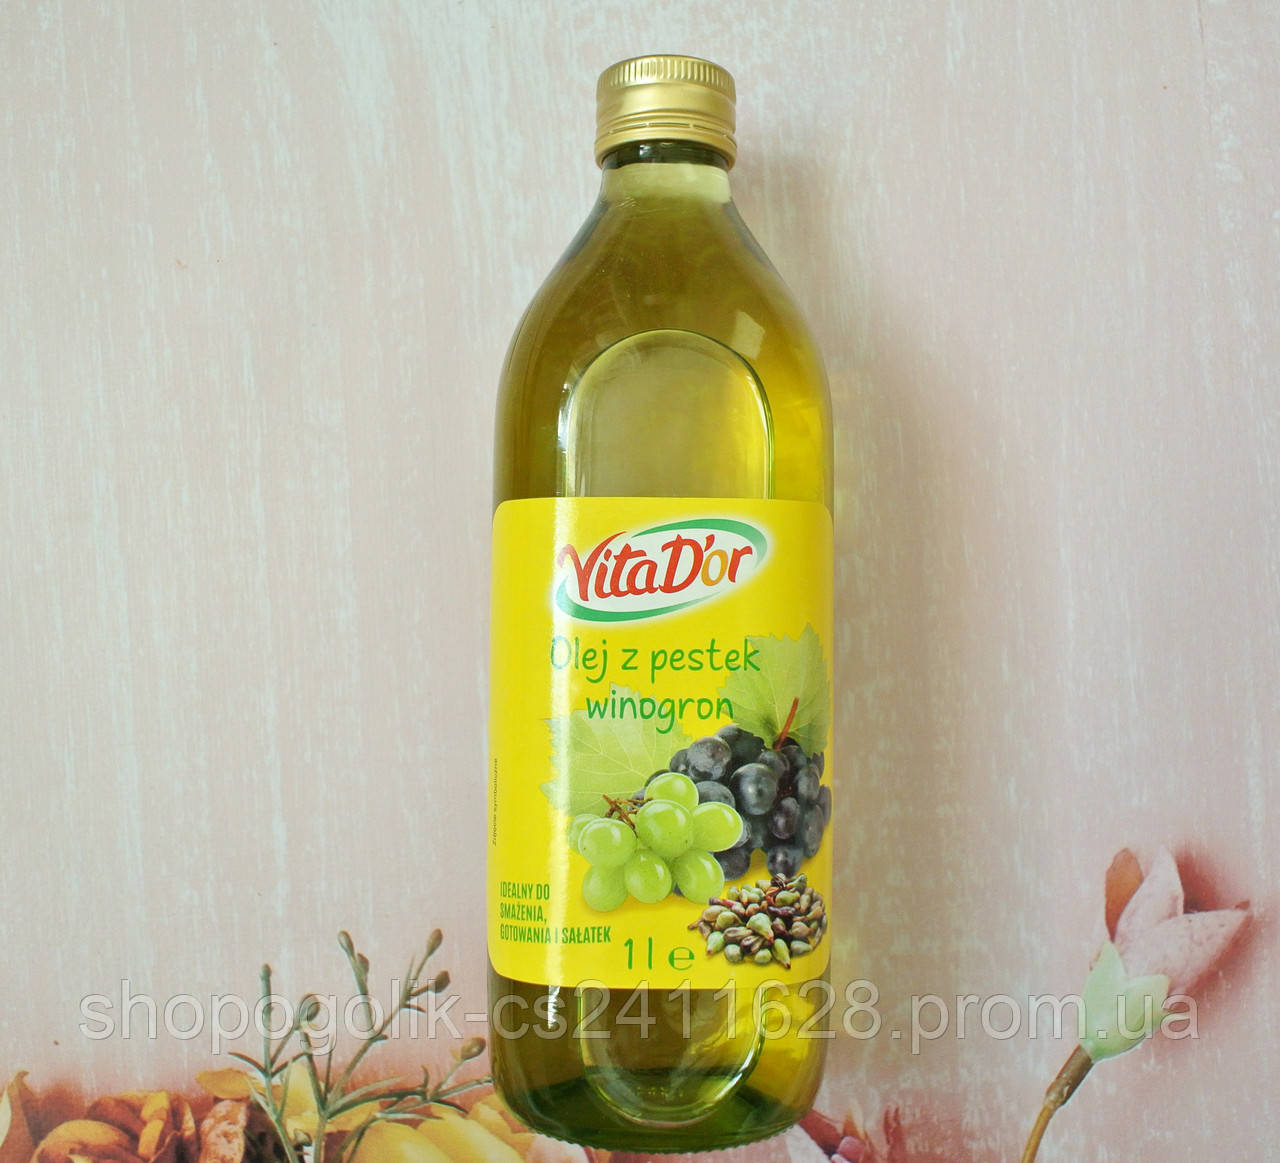 Виноградное масло Vita D'or, фото 1